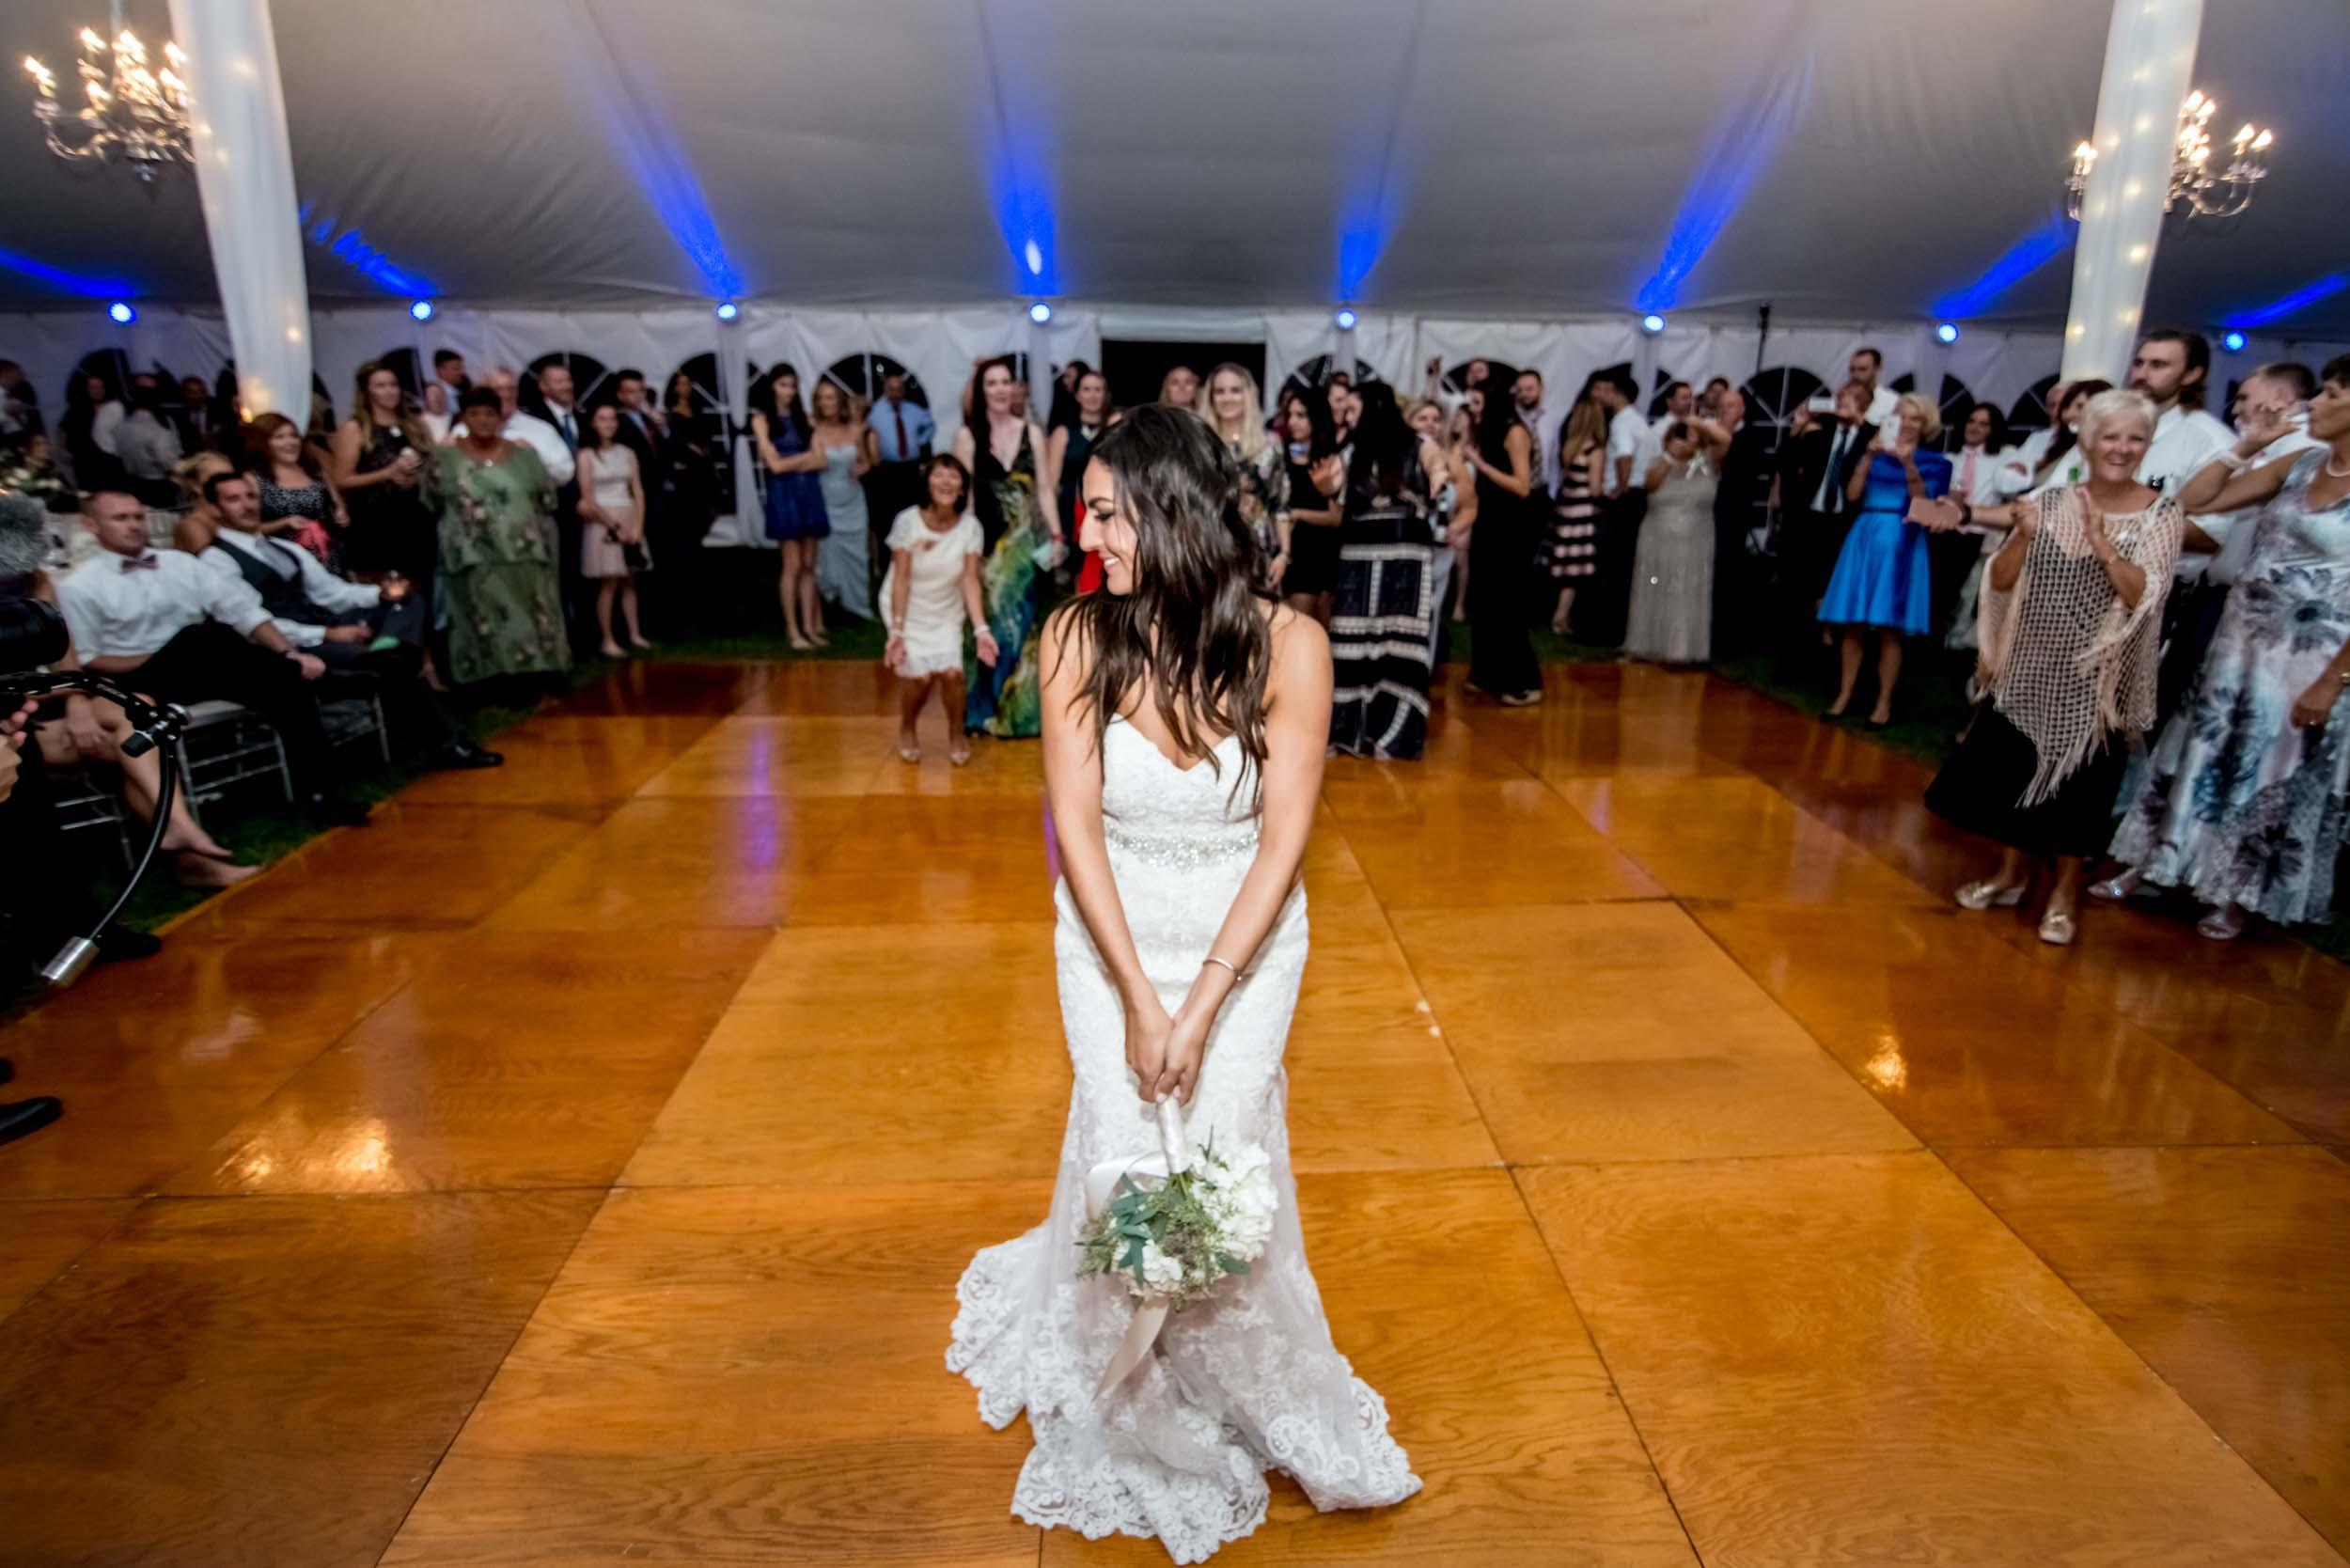 dc+metro+wedding+photographer+vadym+guliuk+photography+wedding+garter+toss-2021.jpg